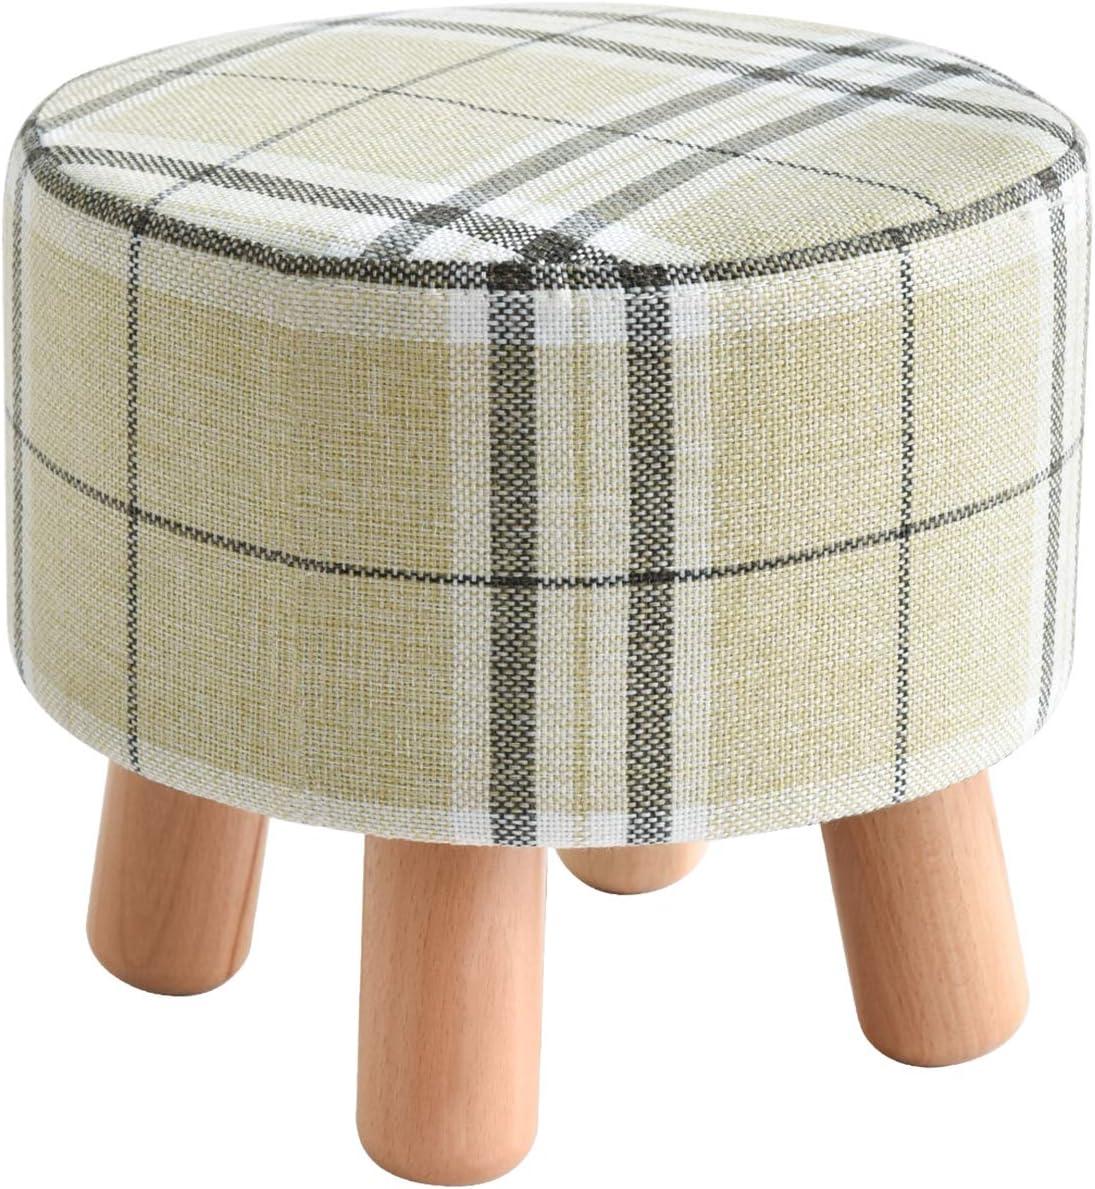 IBUYKE Small Footstool Solid Wood Ottoman Stool Sofa Tea Stool Change Shoes Bench Footrest Stepstool Padded Seat Wooden Legs Living Room Bedroom GL-468